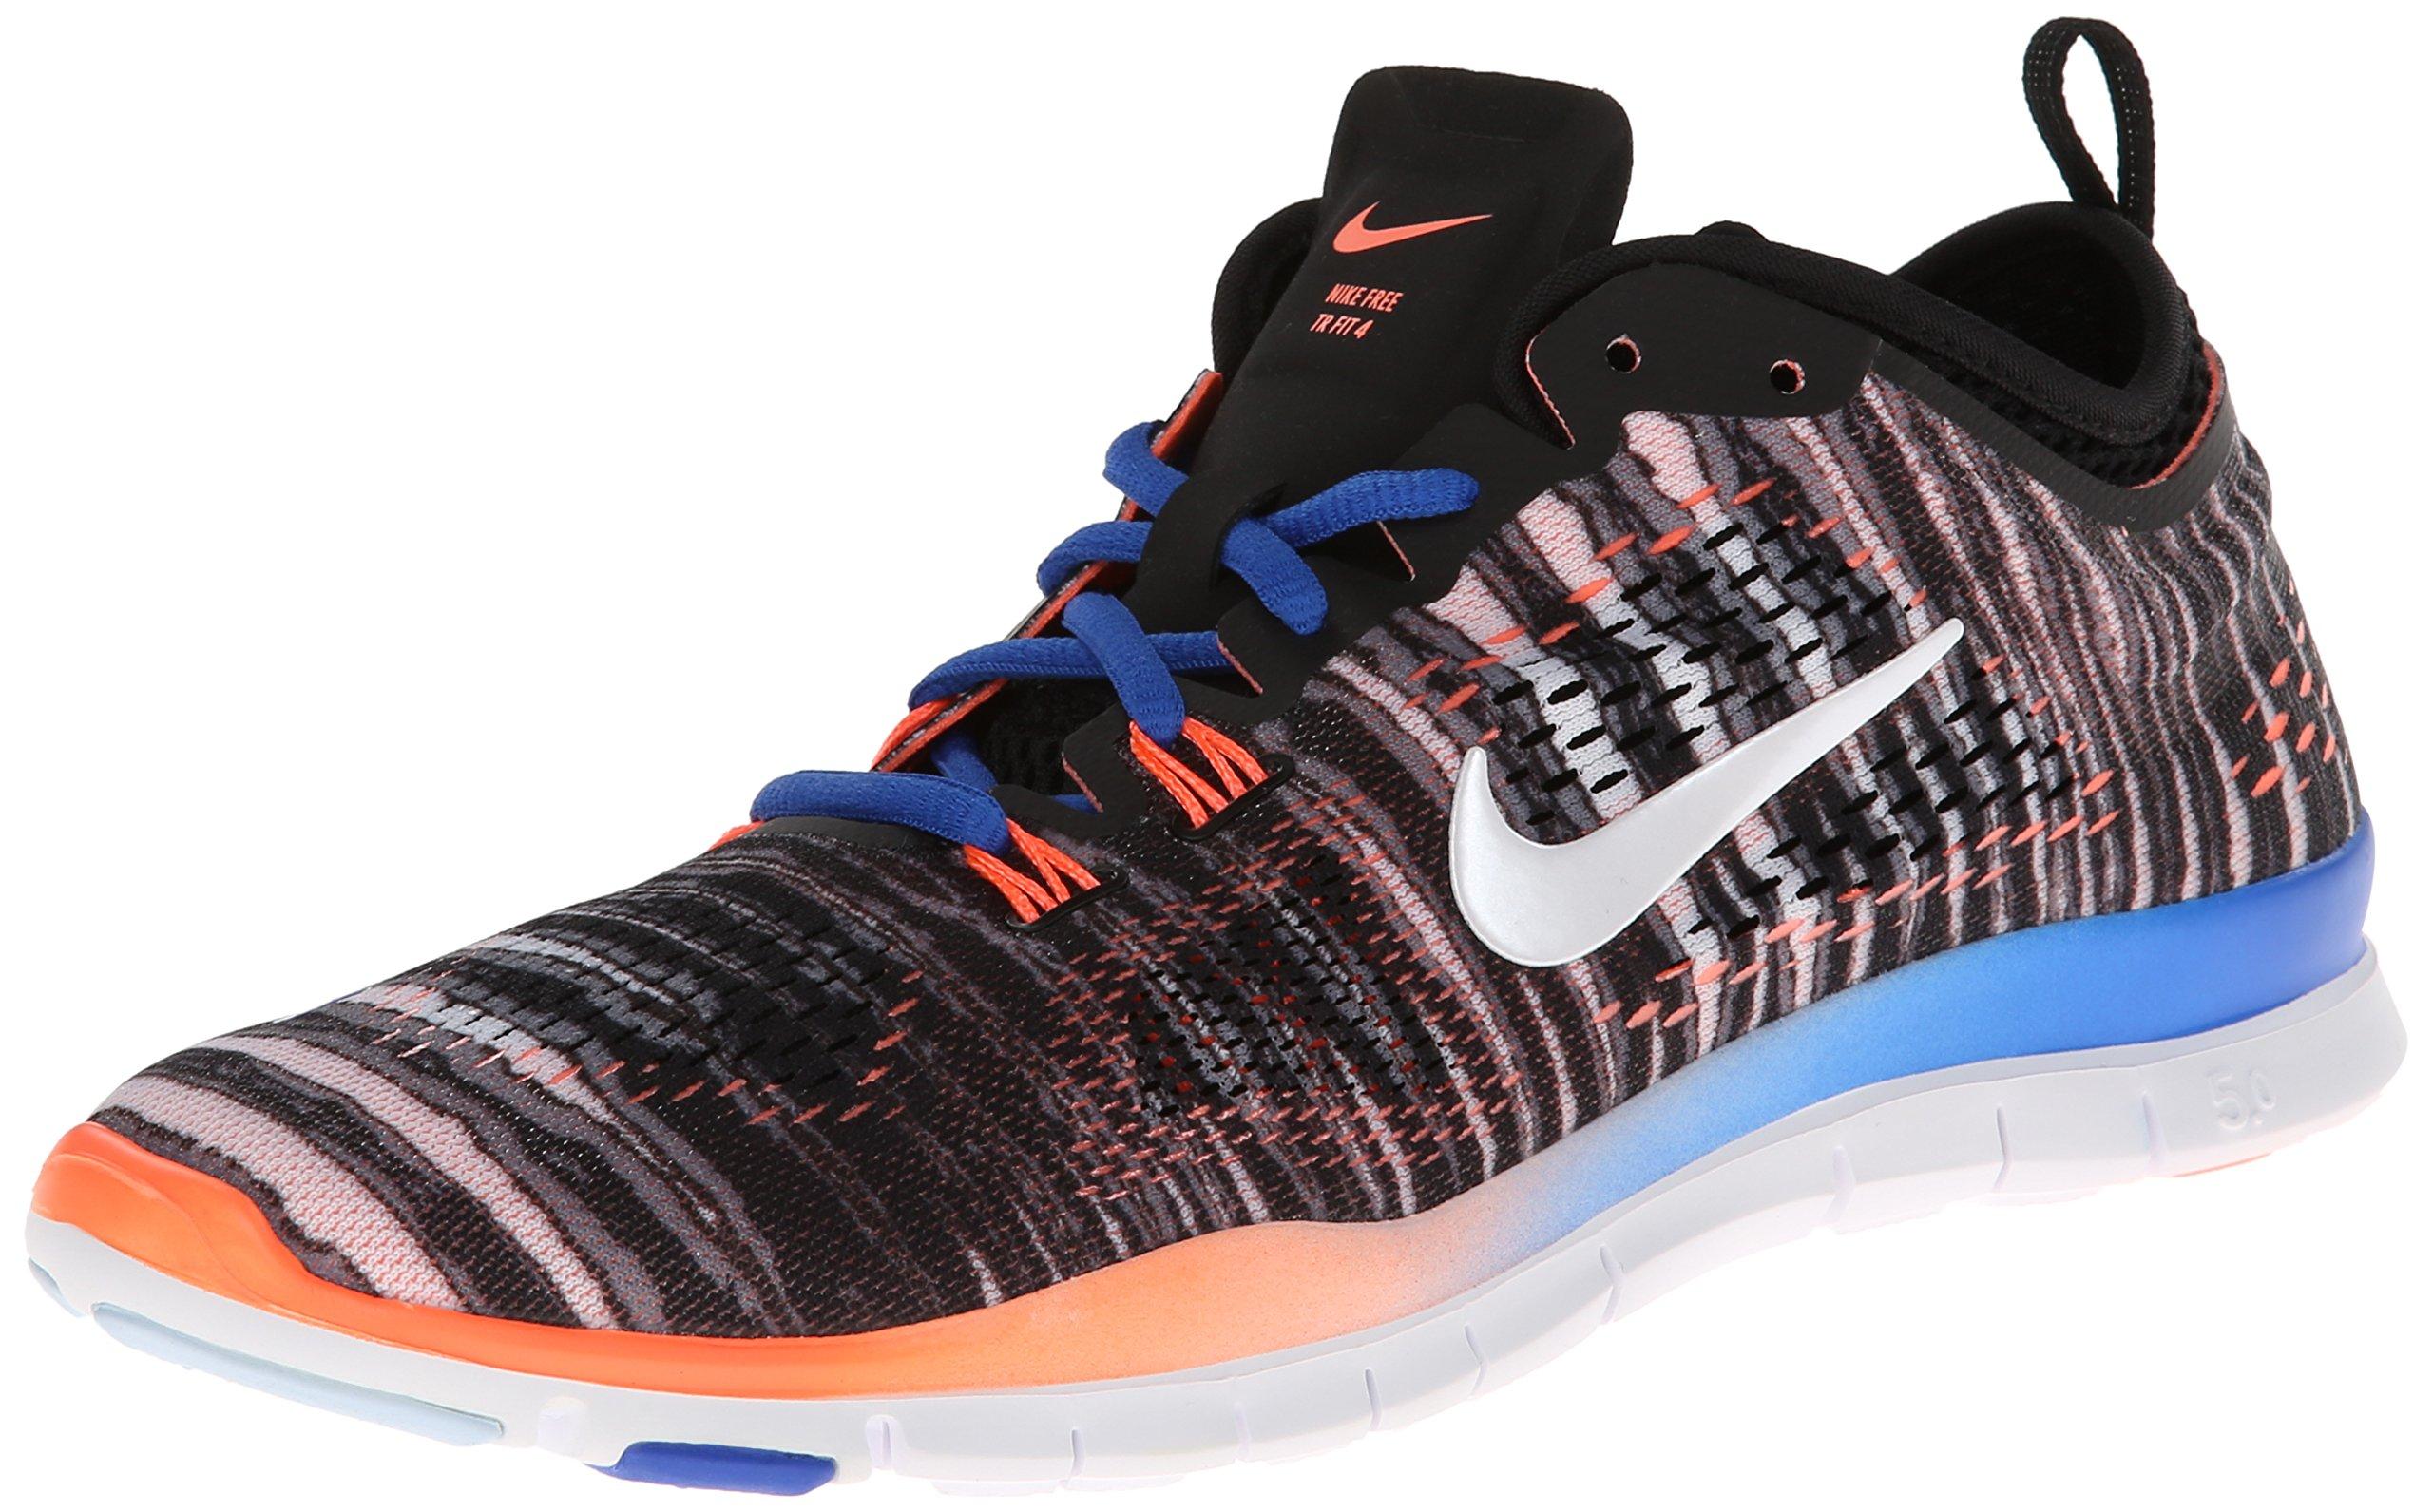 81mWAcx1uIL - Nike Women's sneakers